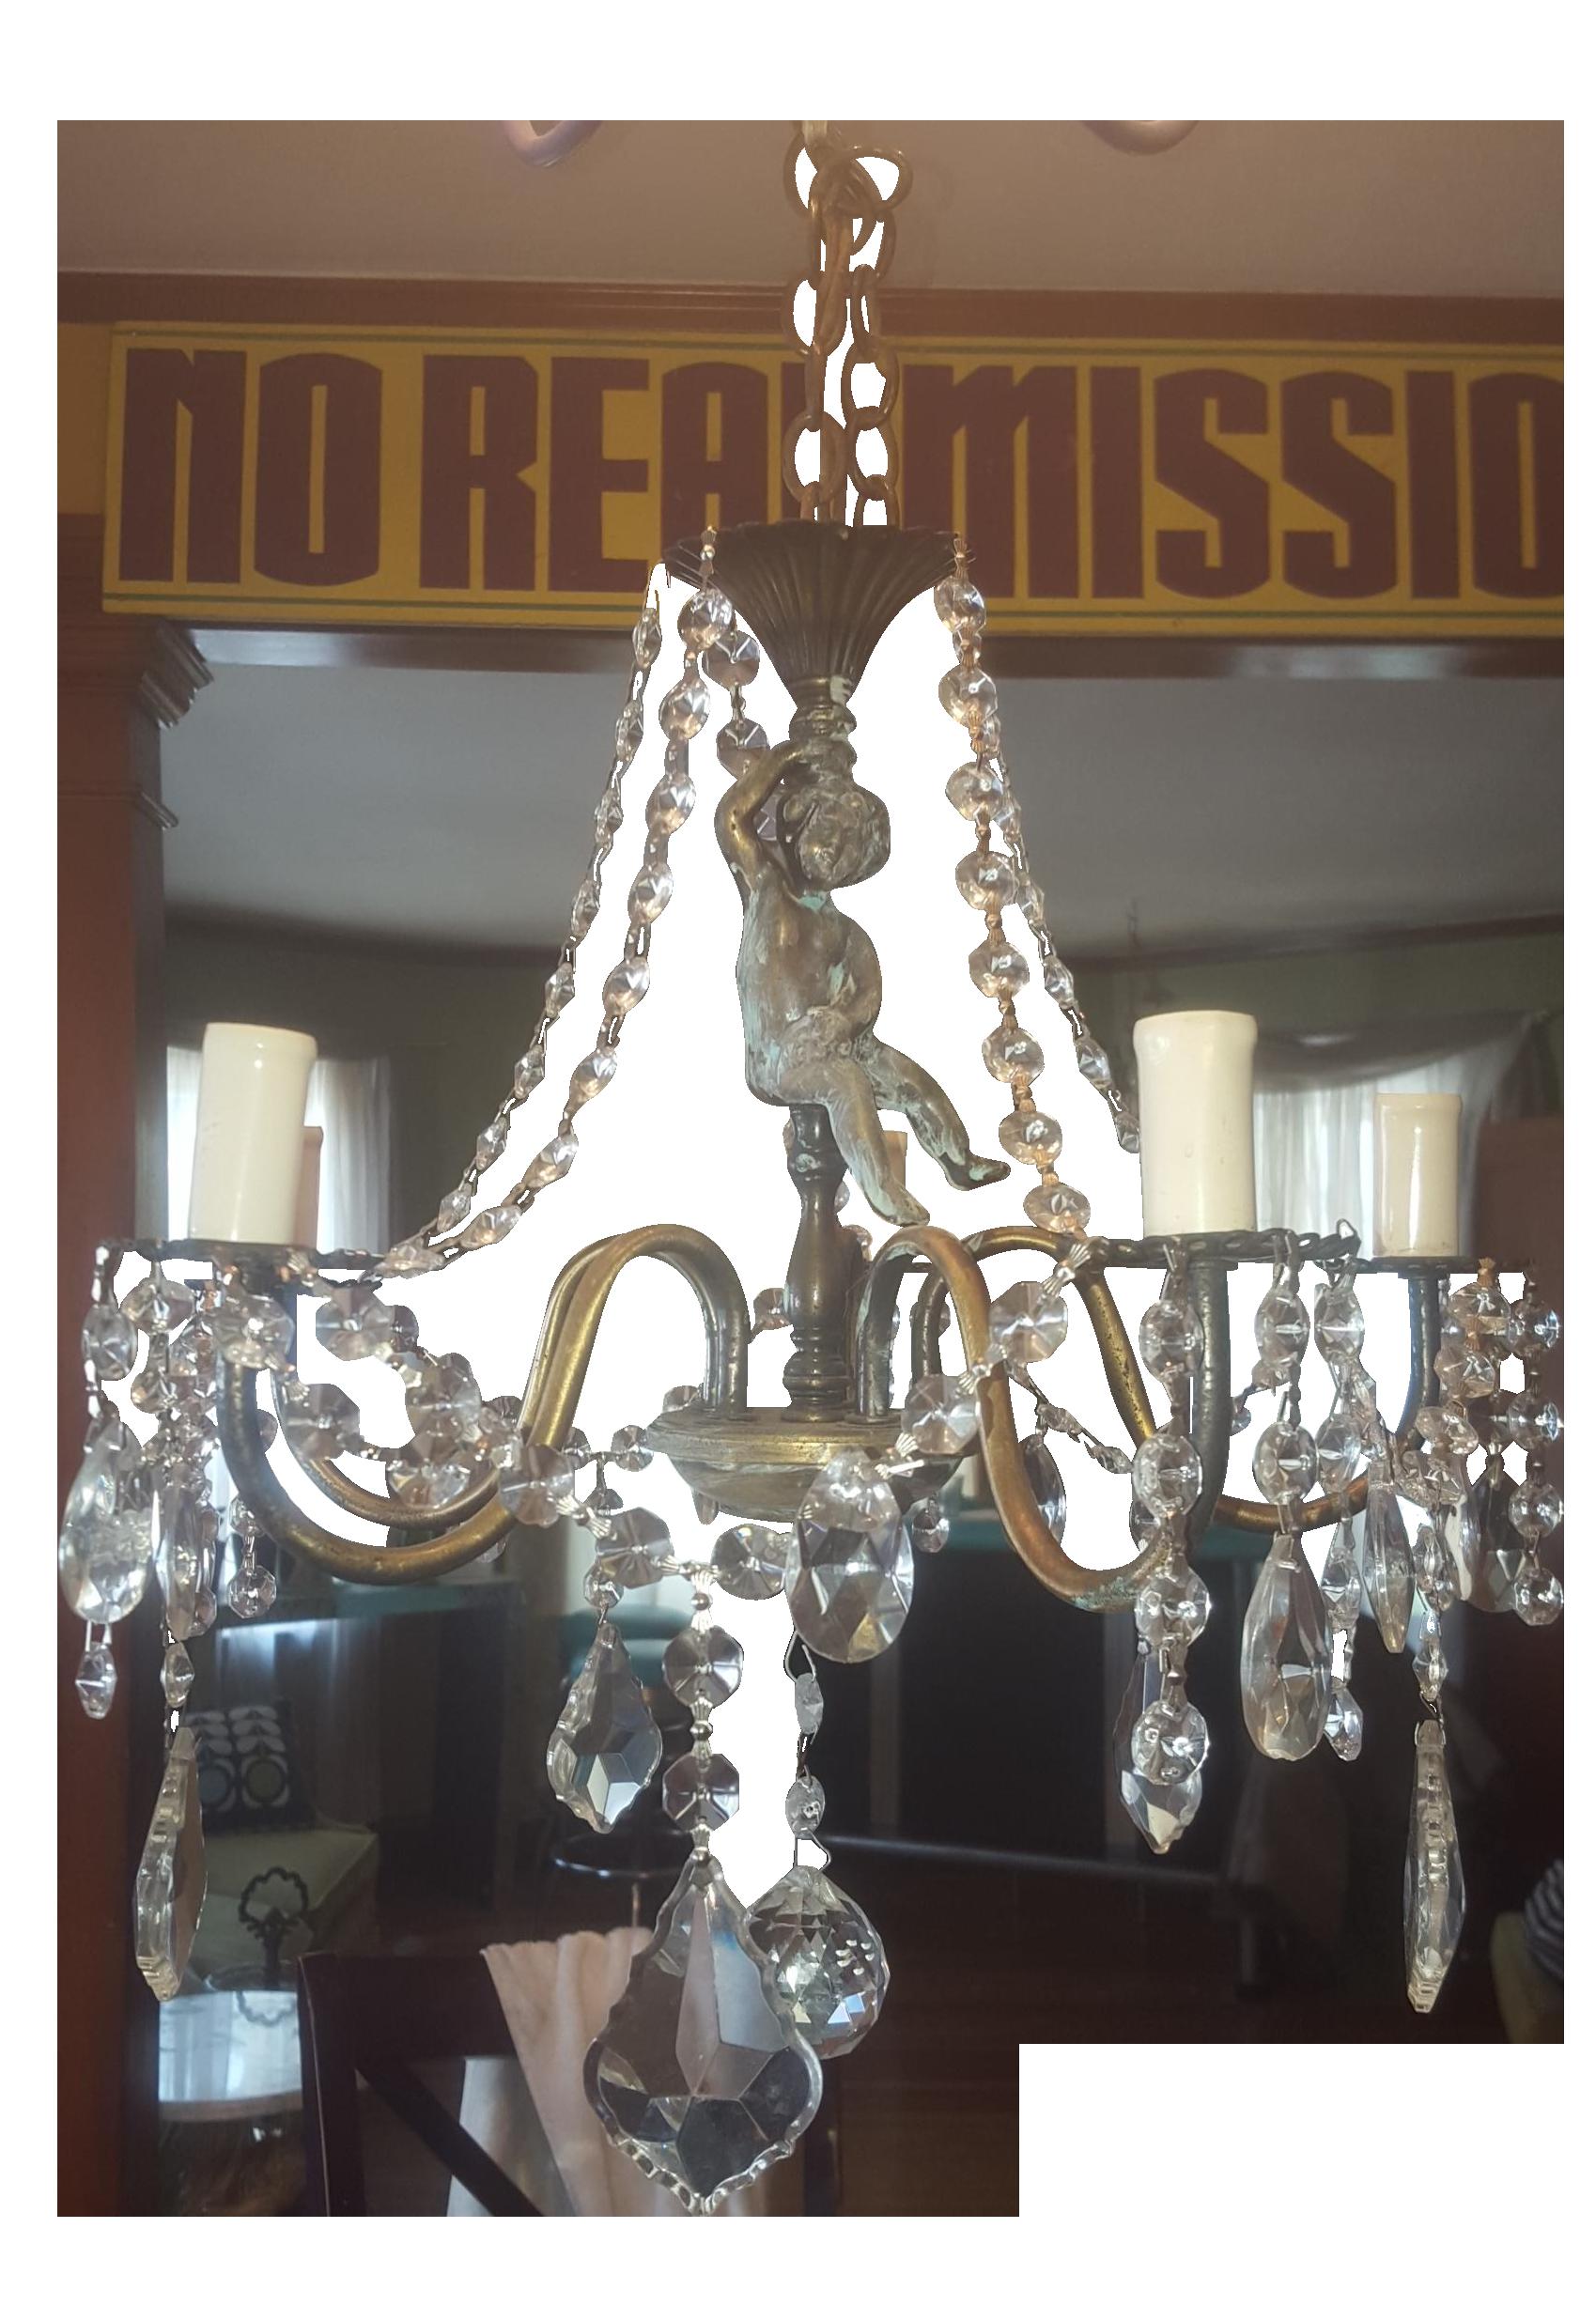 Antique bronze cherub chandelier chandeliers and lights antique bronze cherub chandelier arubaitofo Gallery